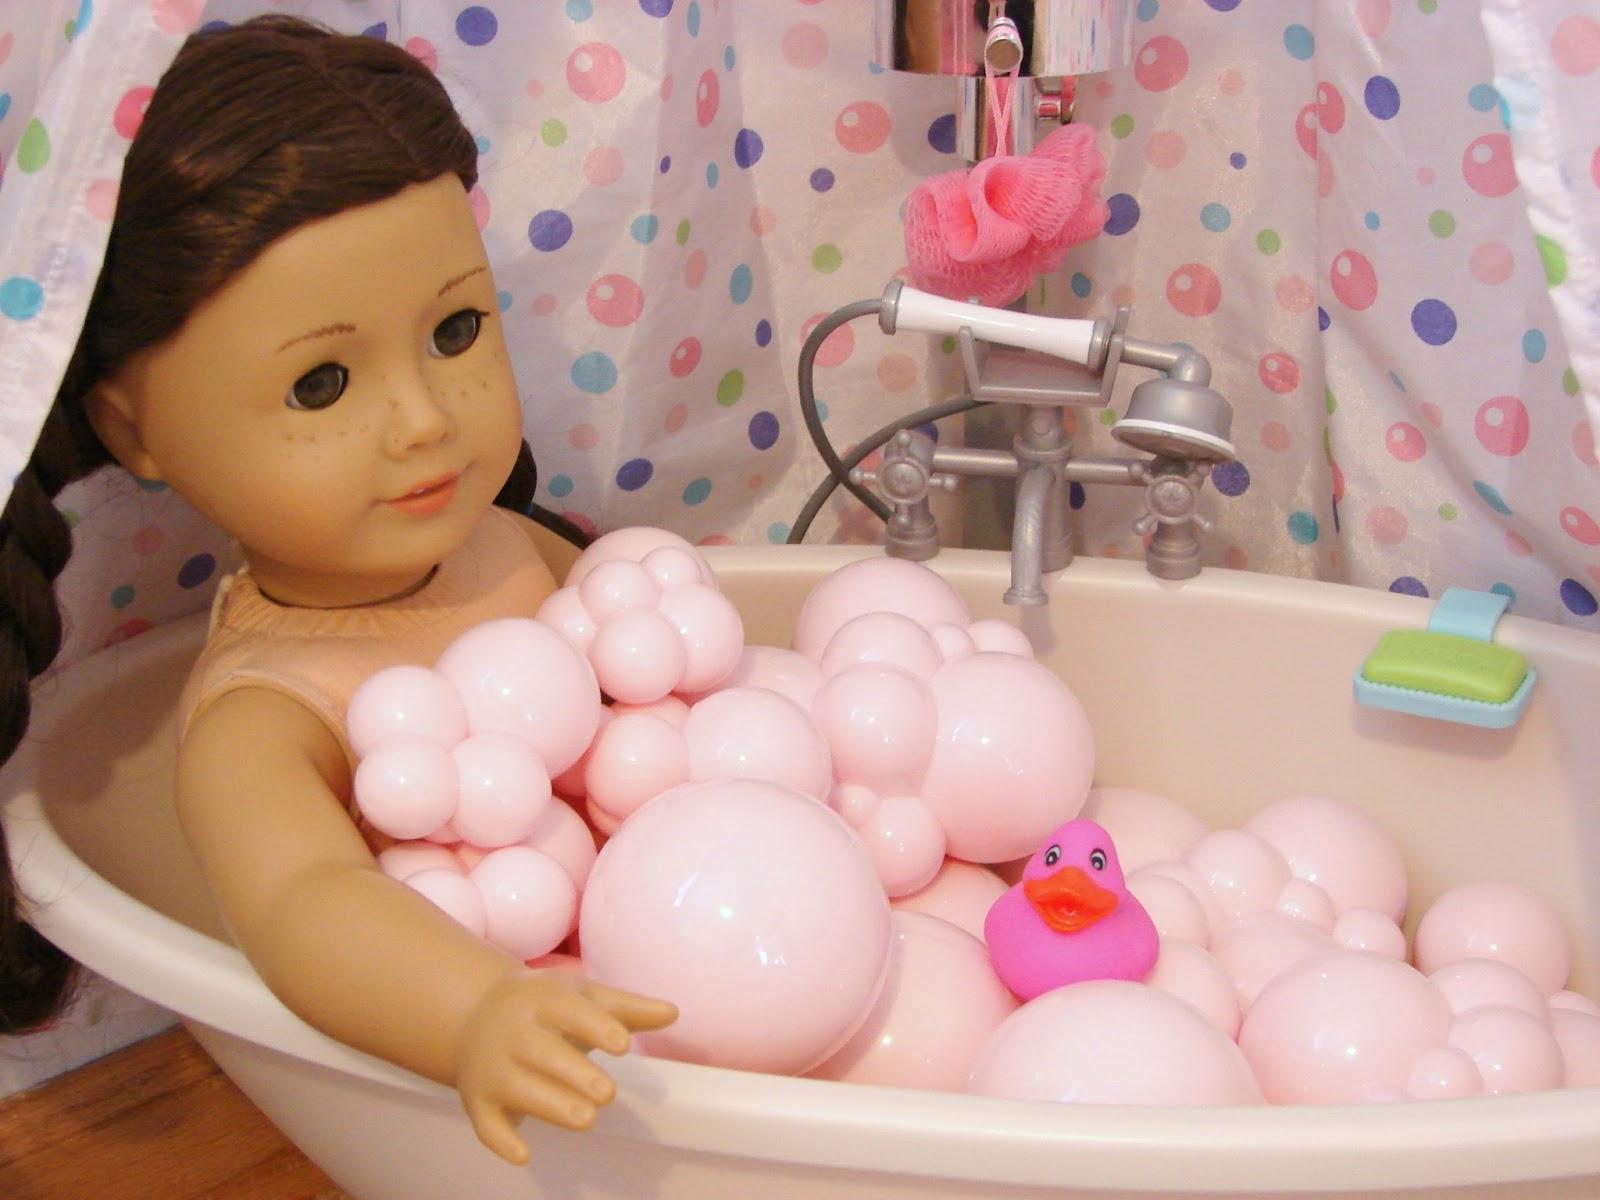 American Girl Doll Play Our Doll Play Area The Bathroom